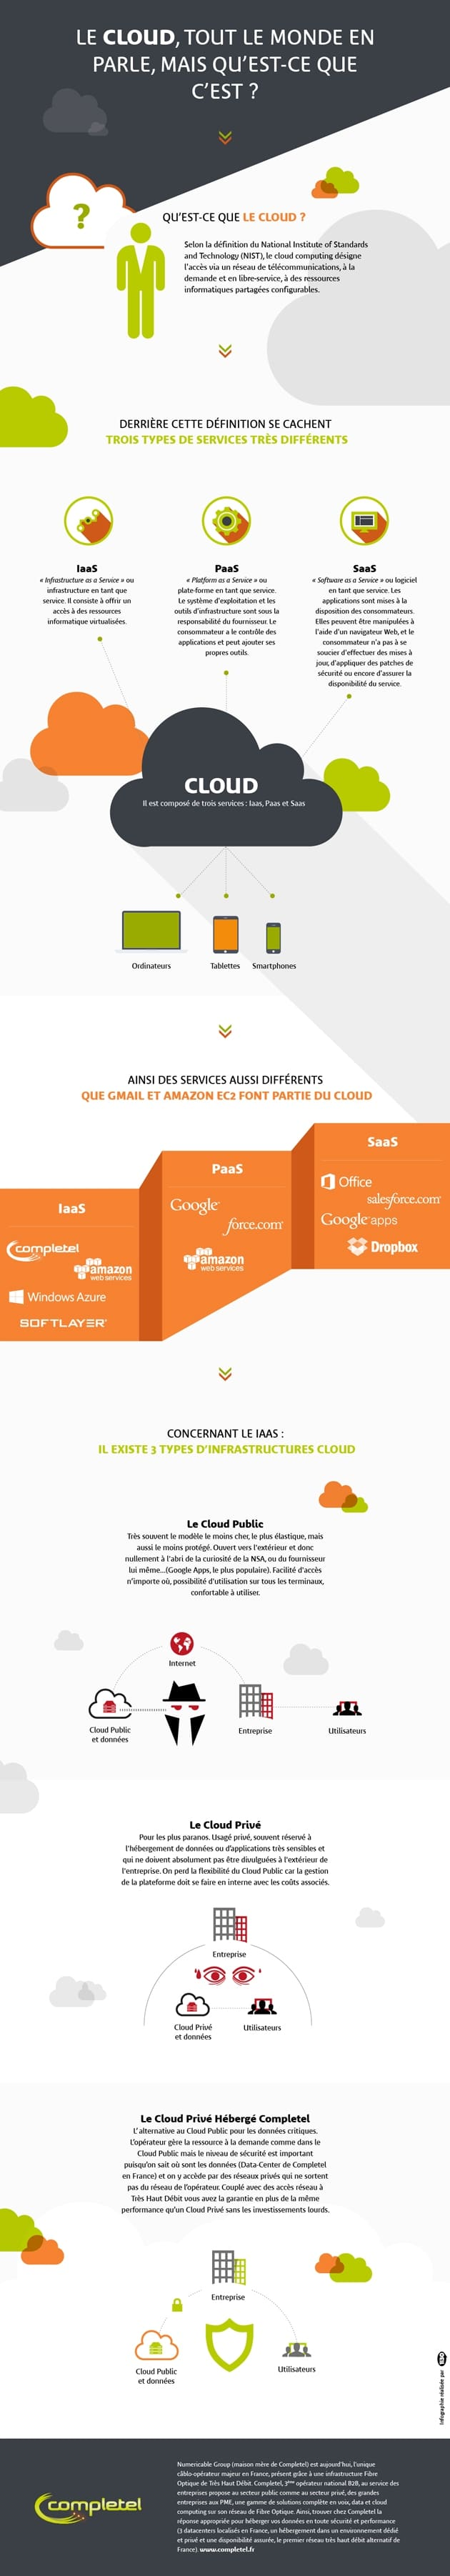 Infographie Cloud Completel